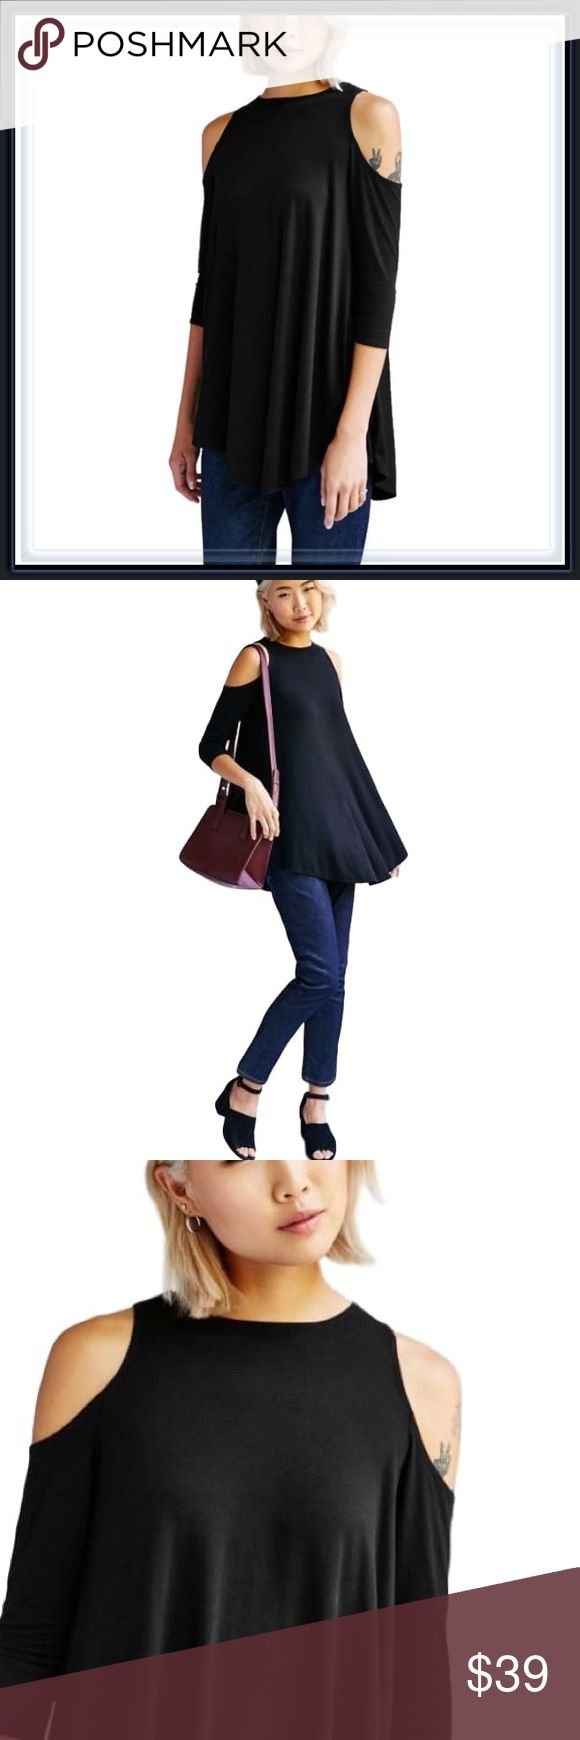 Black Sleek Cold Shoulder Top ➖SIZE: Small, Medium, Large ➖A sleek black Cold Shoulder Tunic Top    ❌NO TRADE   # off the shoulder Tops Tunics